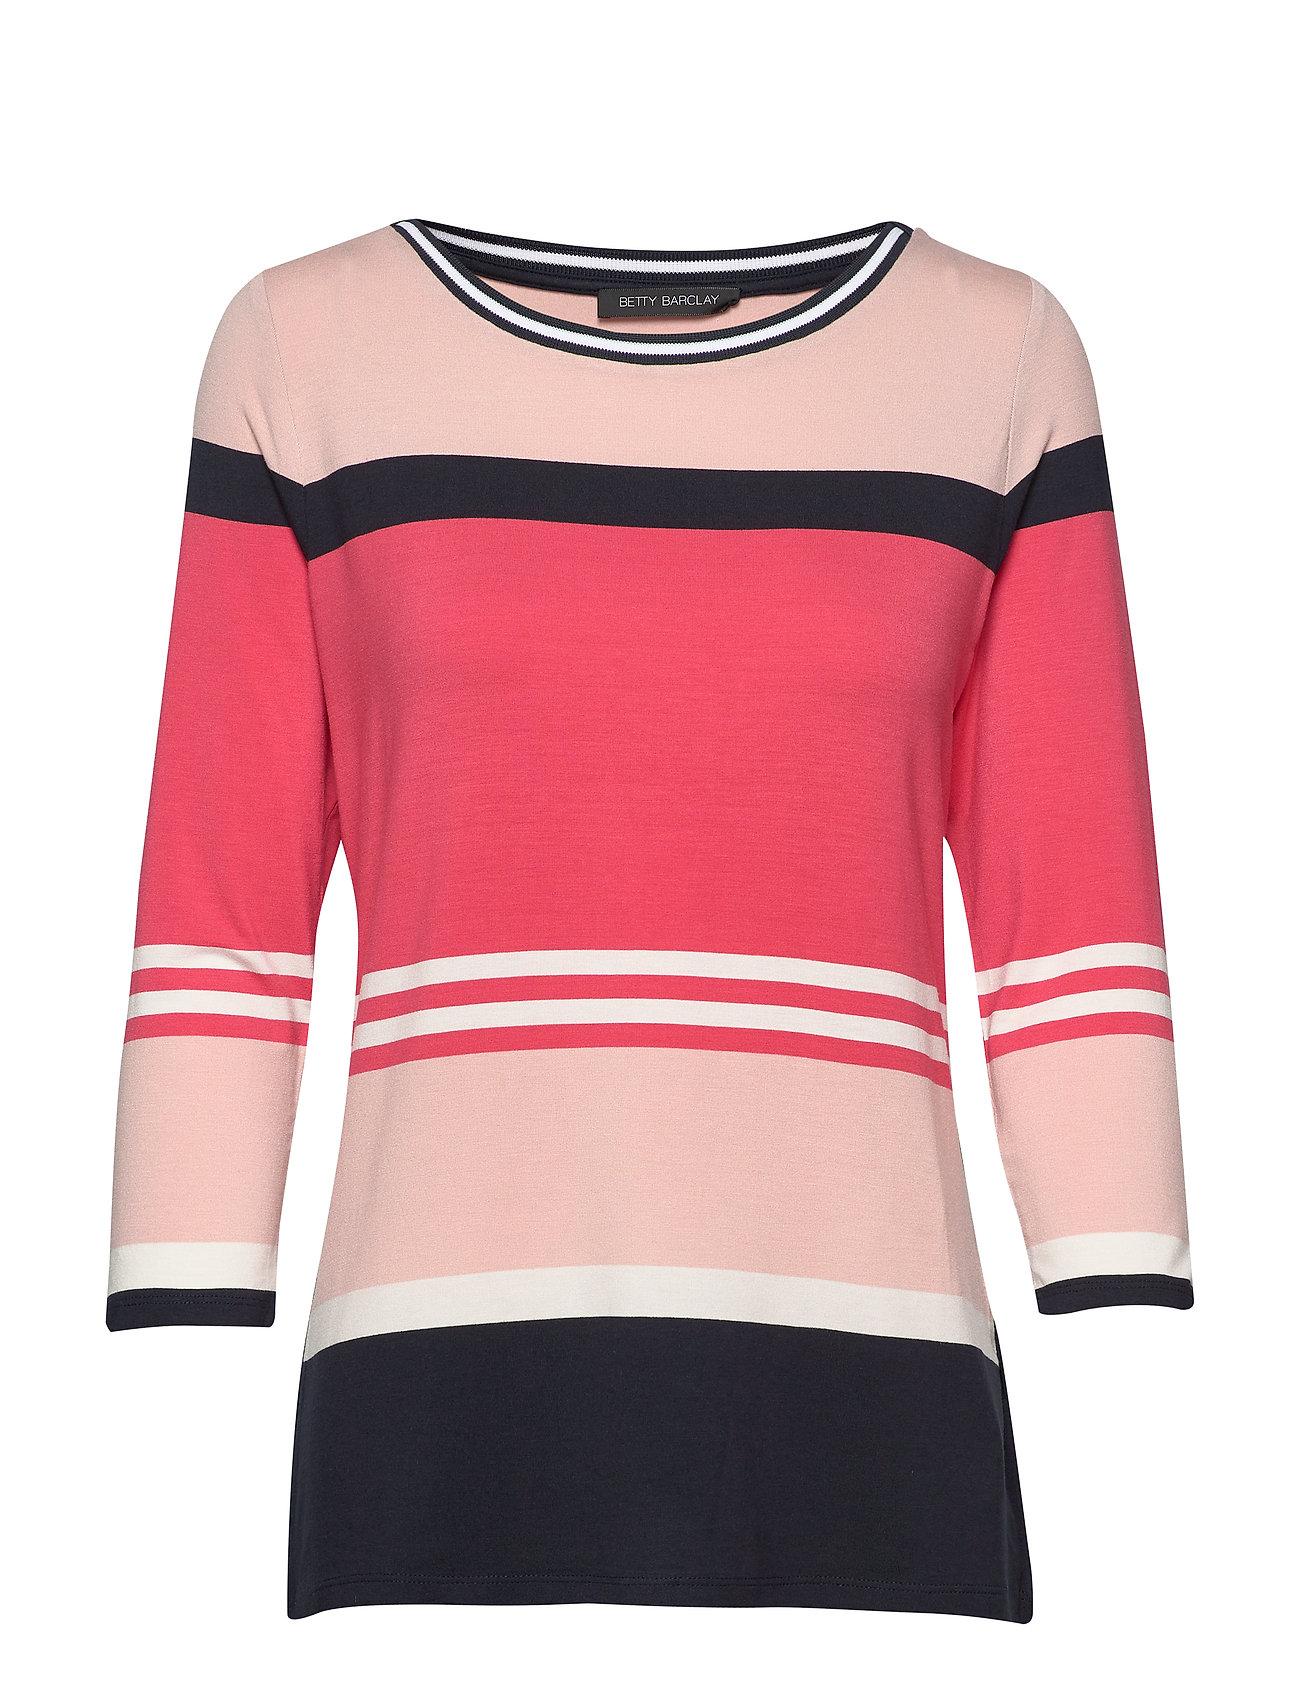 Betty Barclay Shirt Short 3/4 Sleeve - RED/DARK BLUE